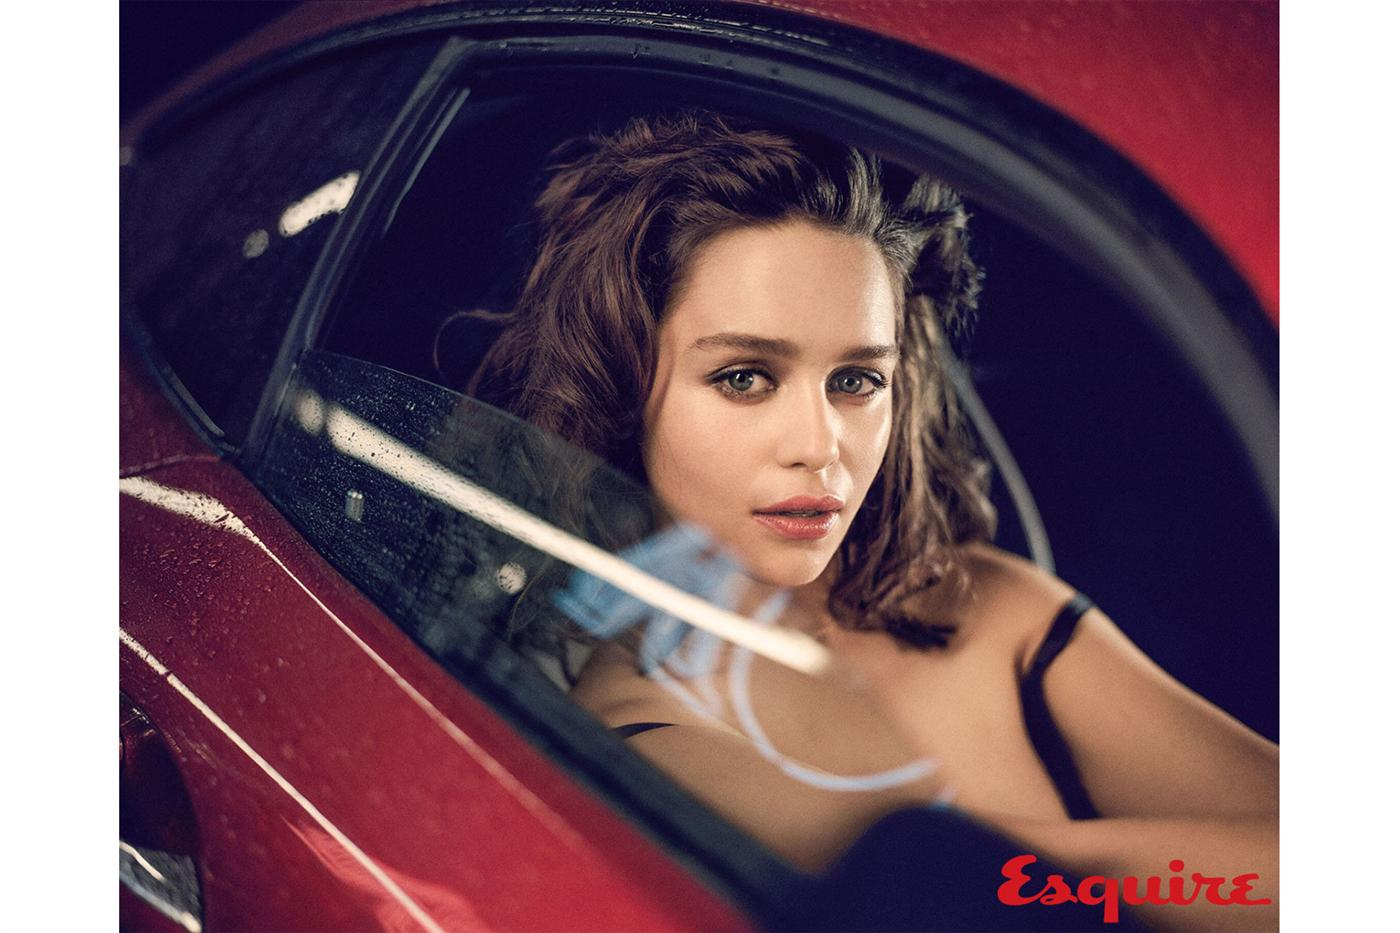 The Sexiest Woman Alive: Emilia Clarke 4